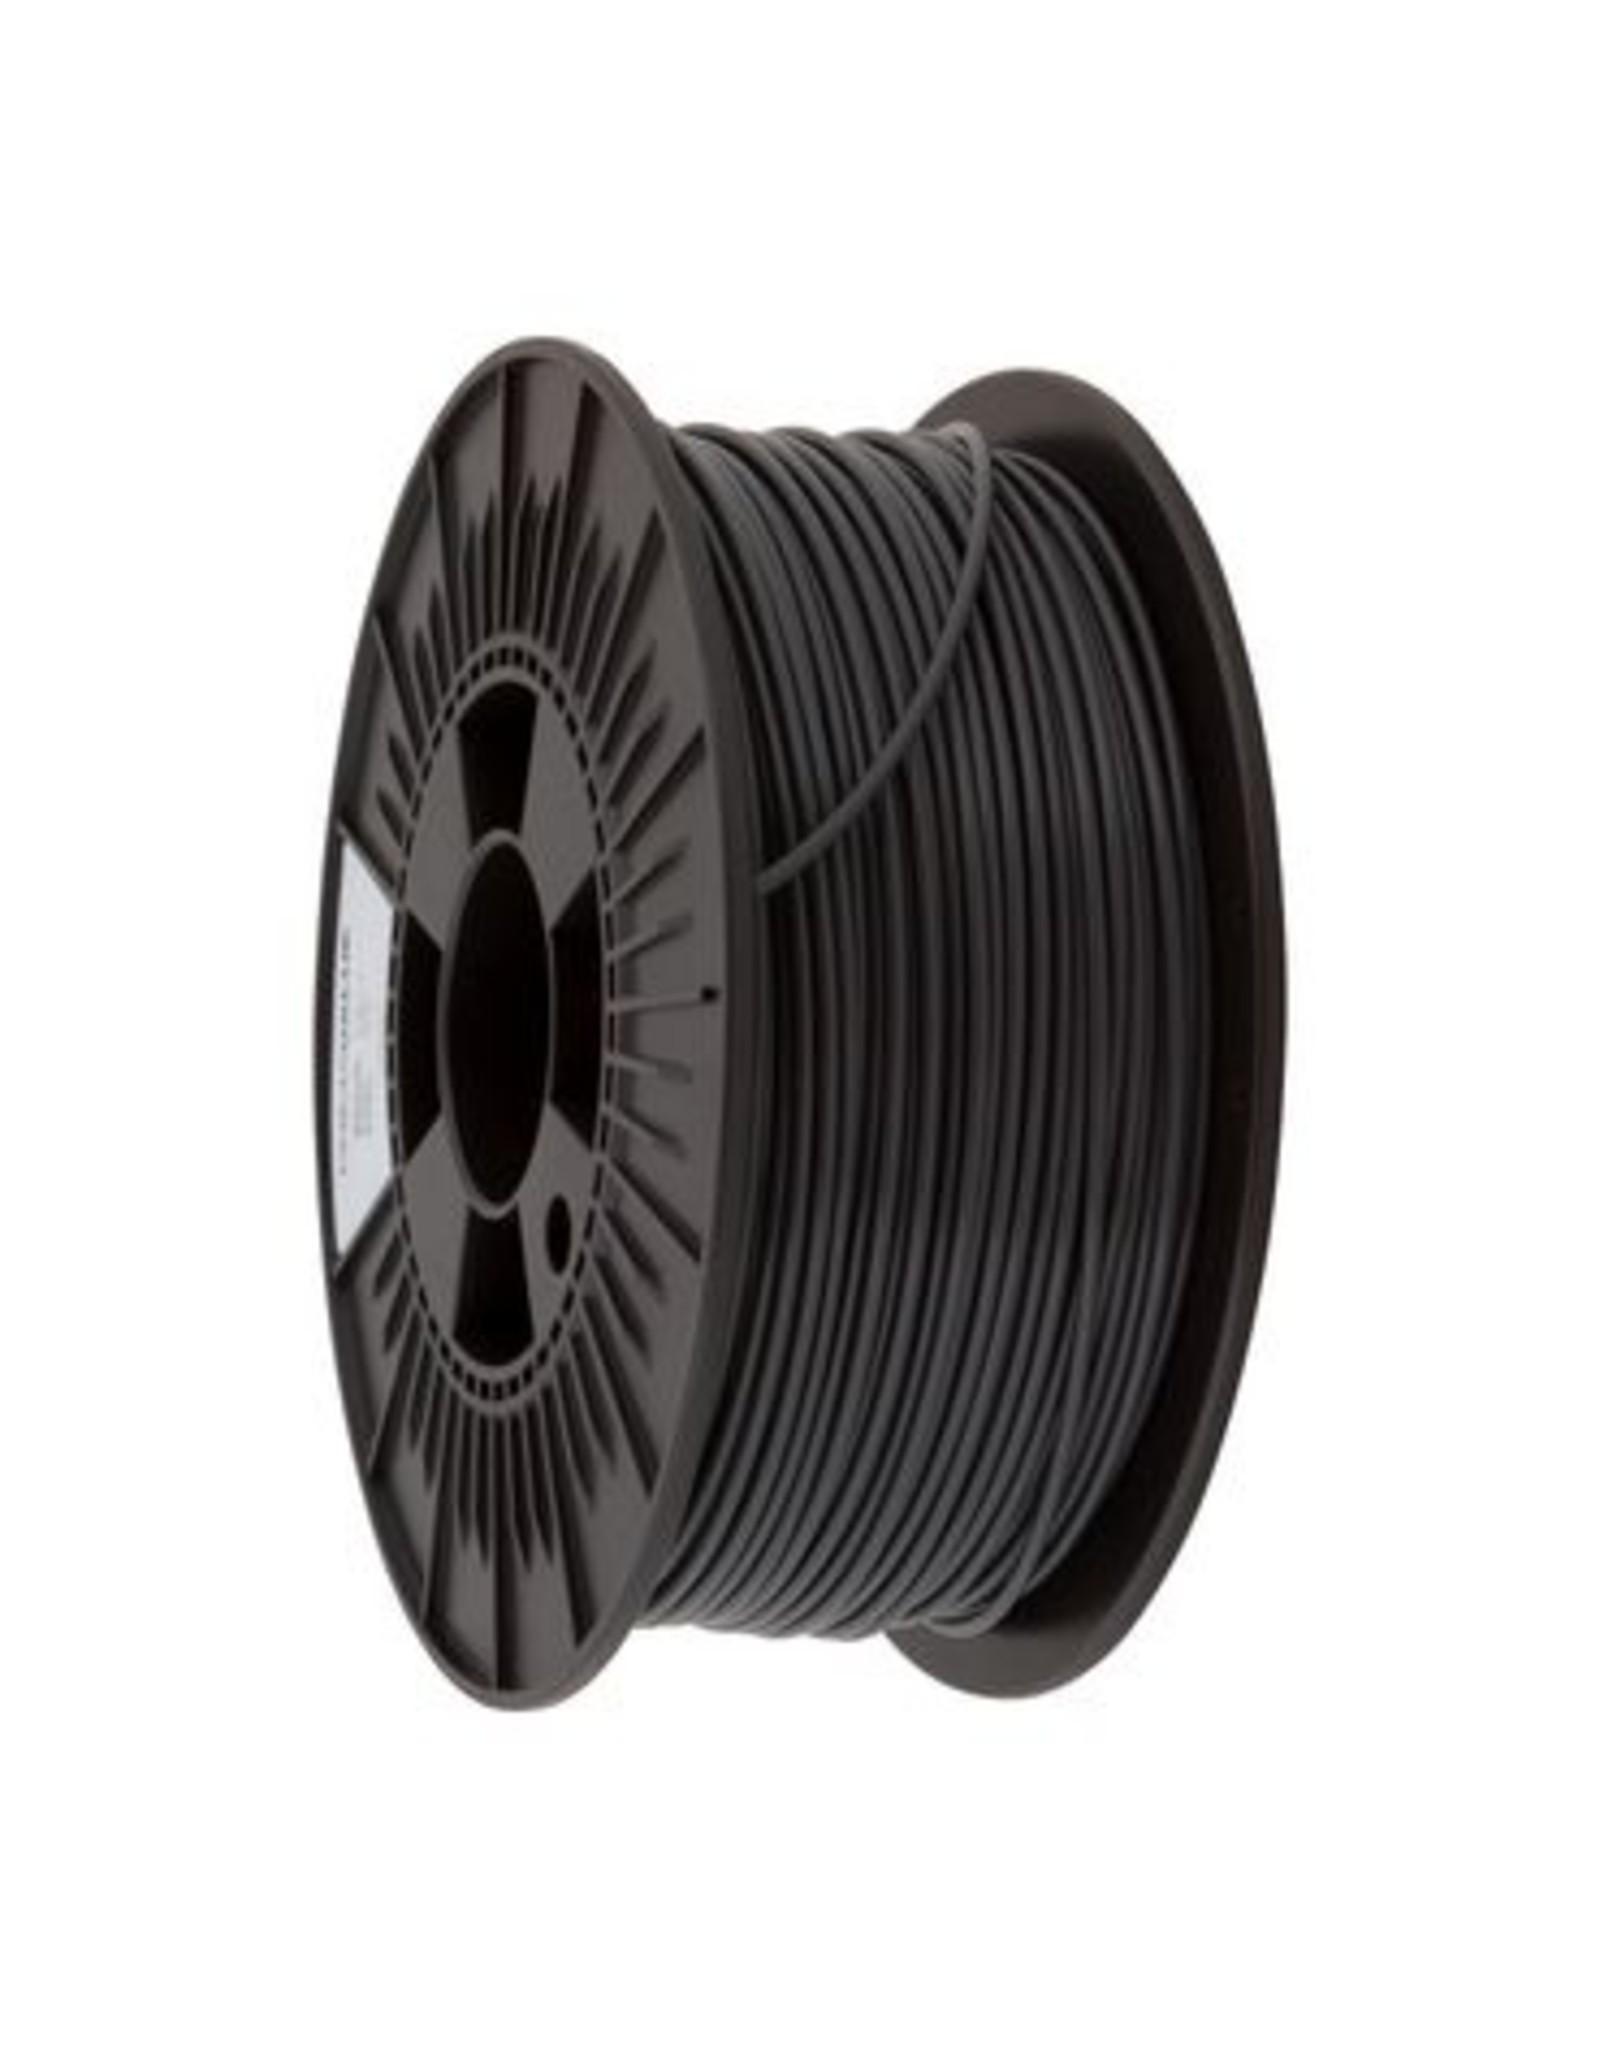 Prima PrimaValue ABS Filament - 1.75mm - 1 kg - Dark Grey